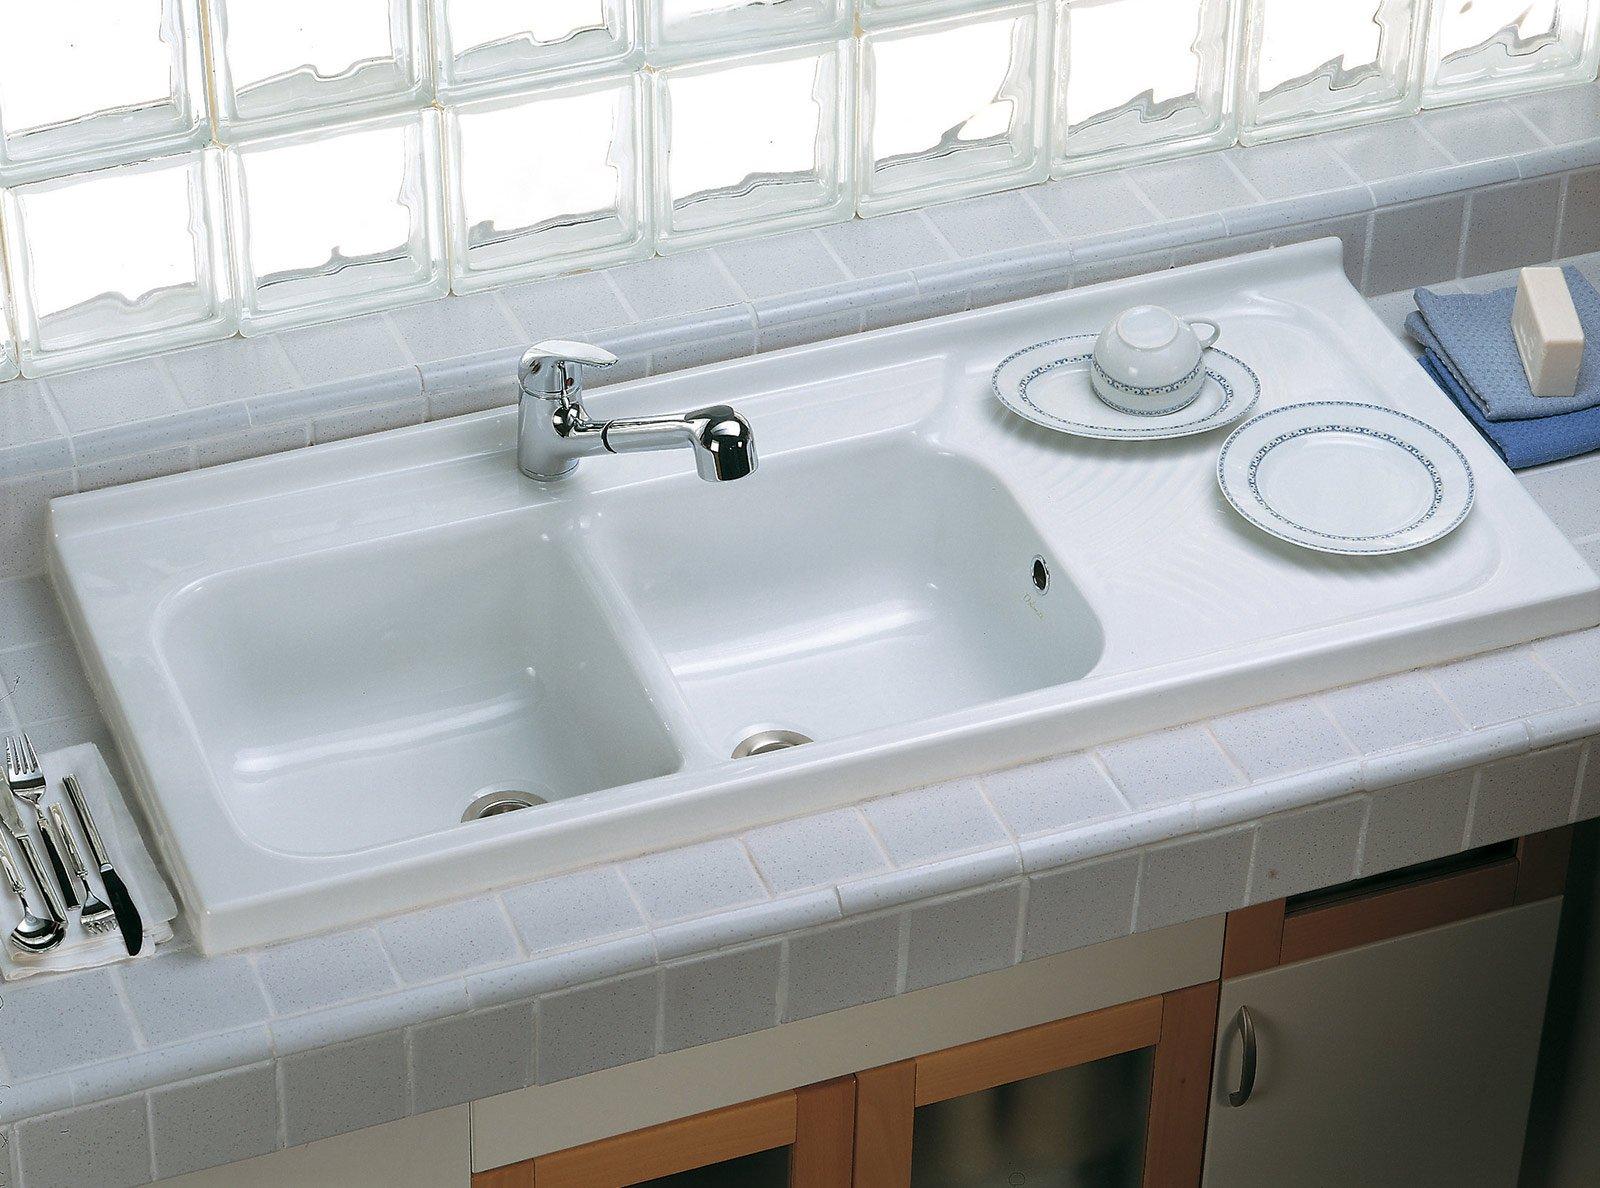 Lavelli come sceglierli cose di casa - Lavandini da cucina in ceramica ...